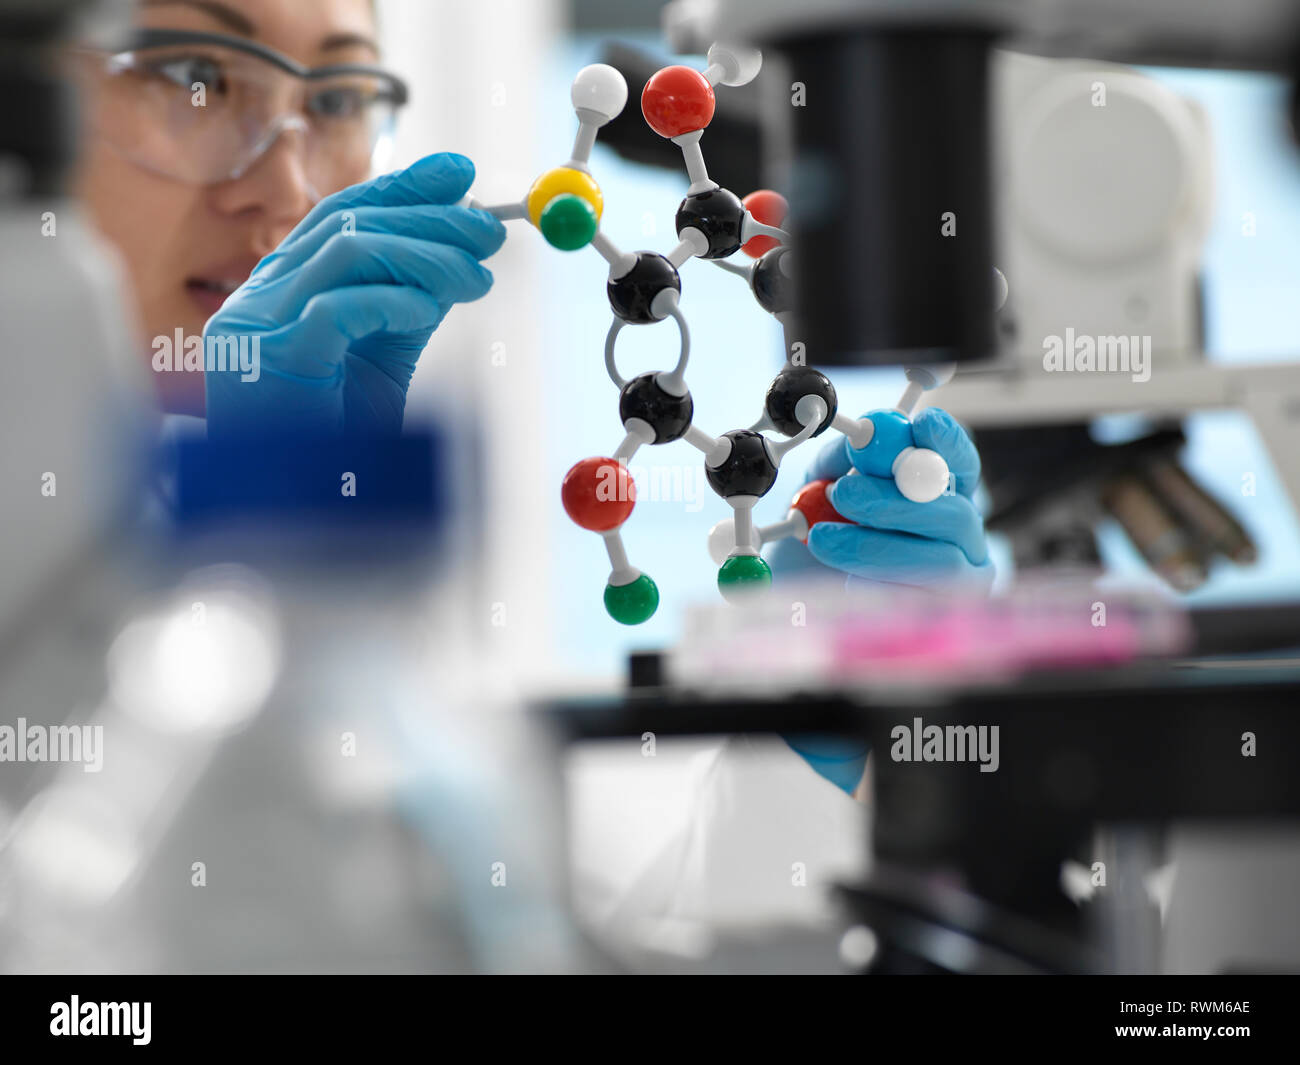 Scientist designing drug formula using ball and stick molecular model in laboratory - Stock Image